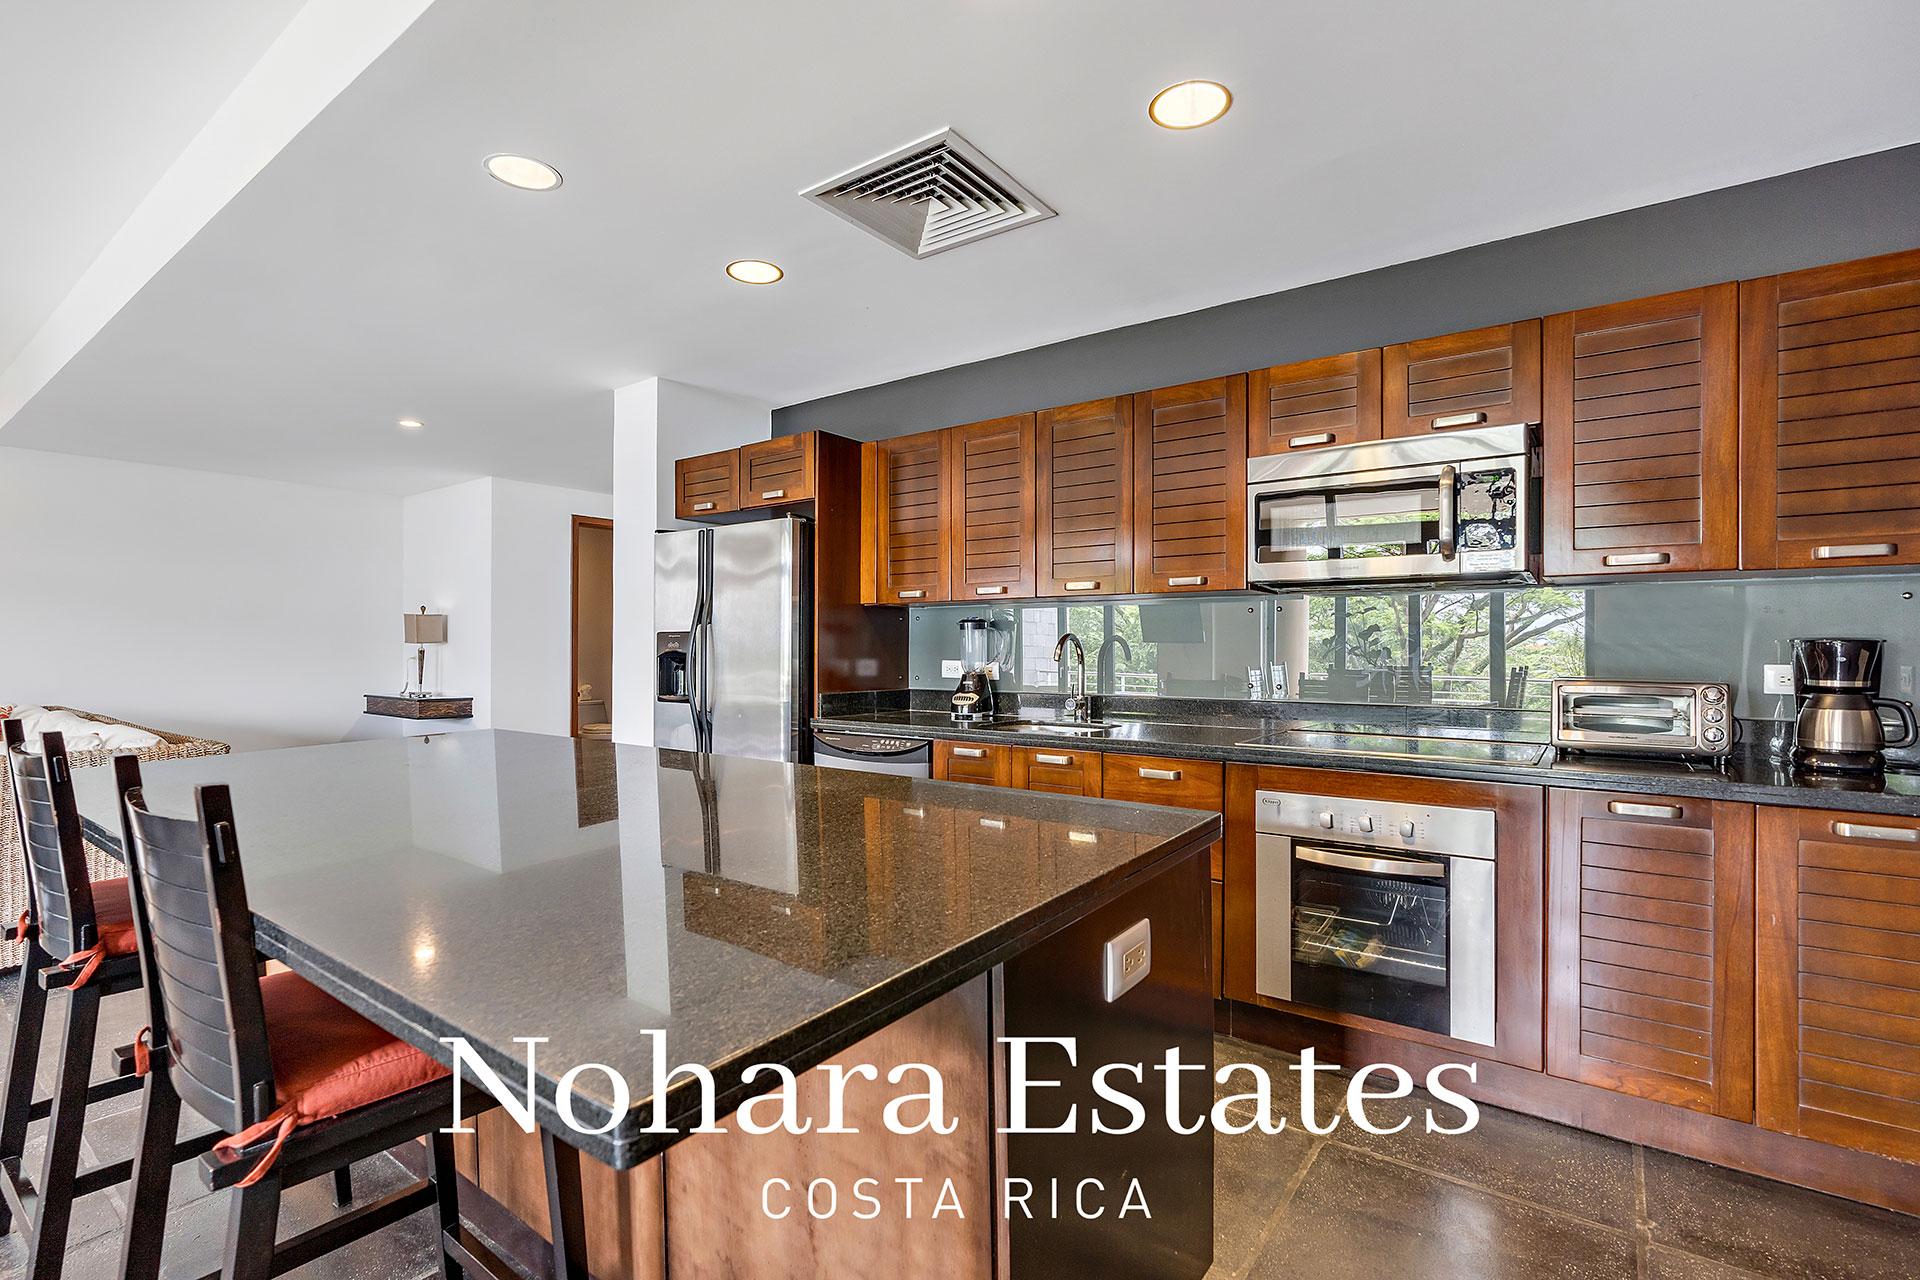 Nohara Estates Costa Rica 125 Apartment Quepos Los Altos 6